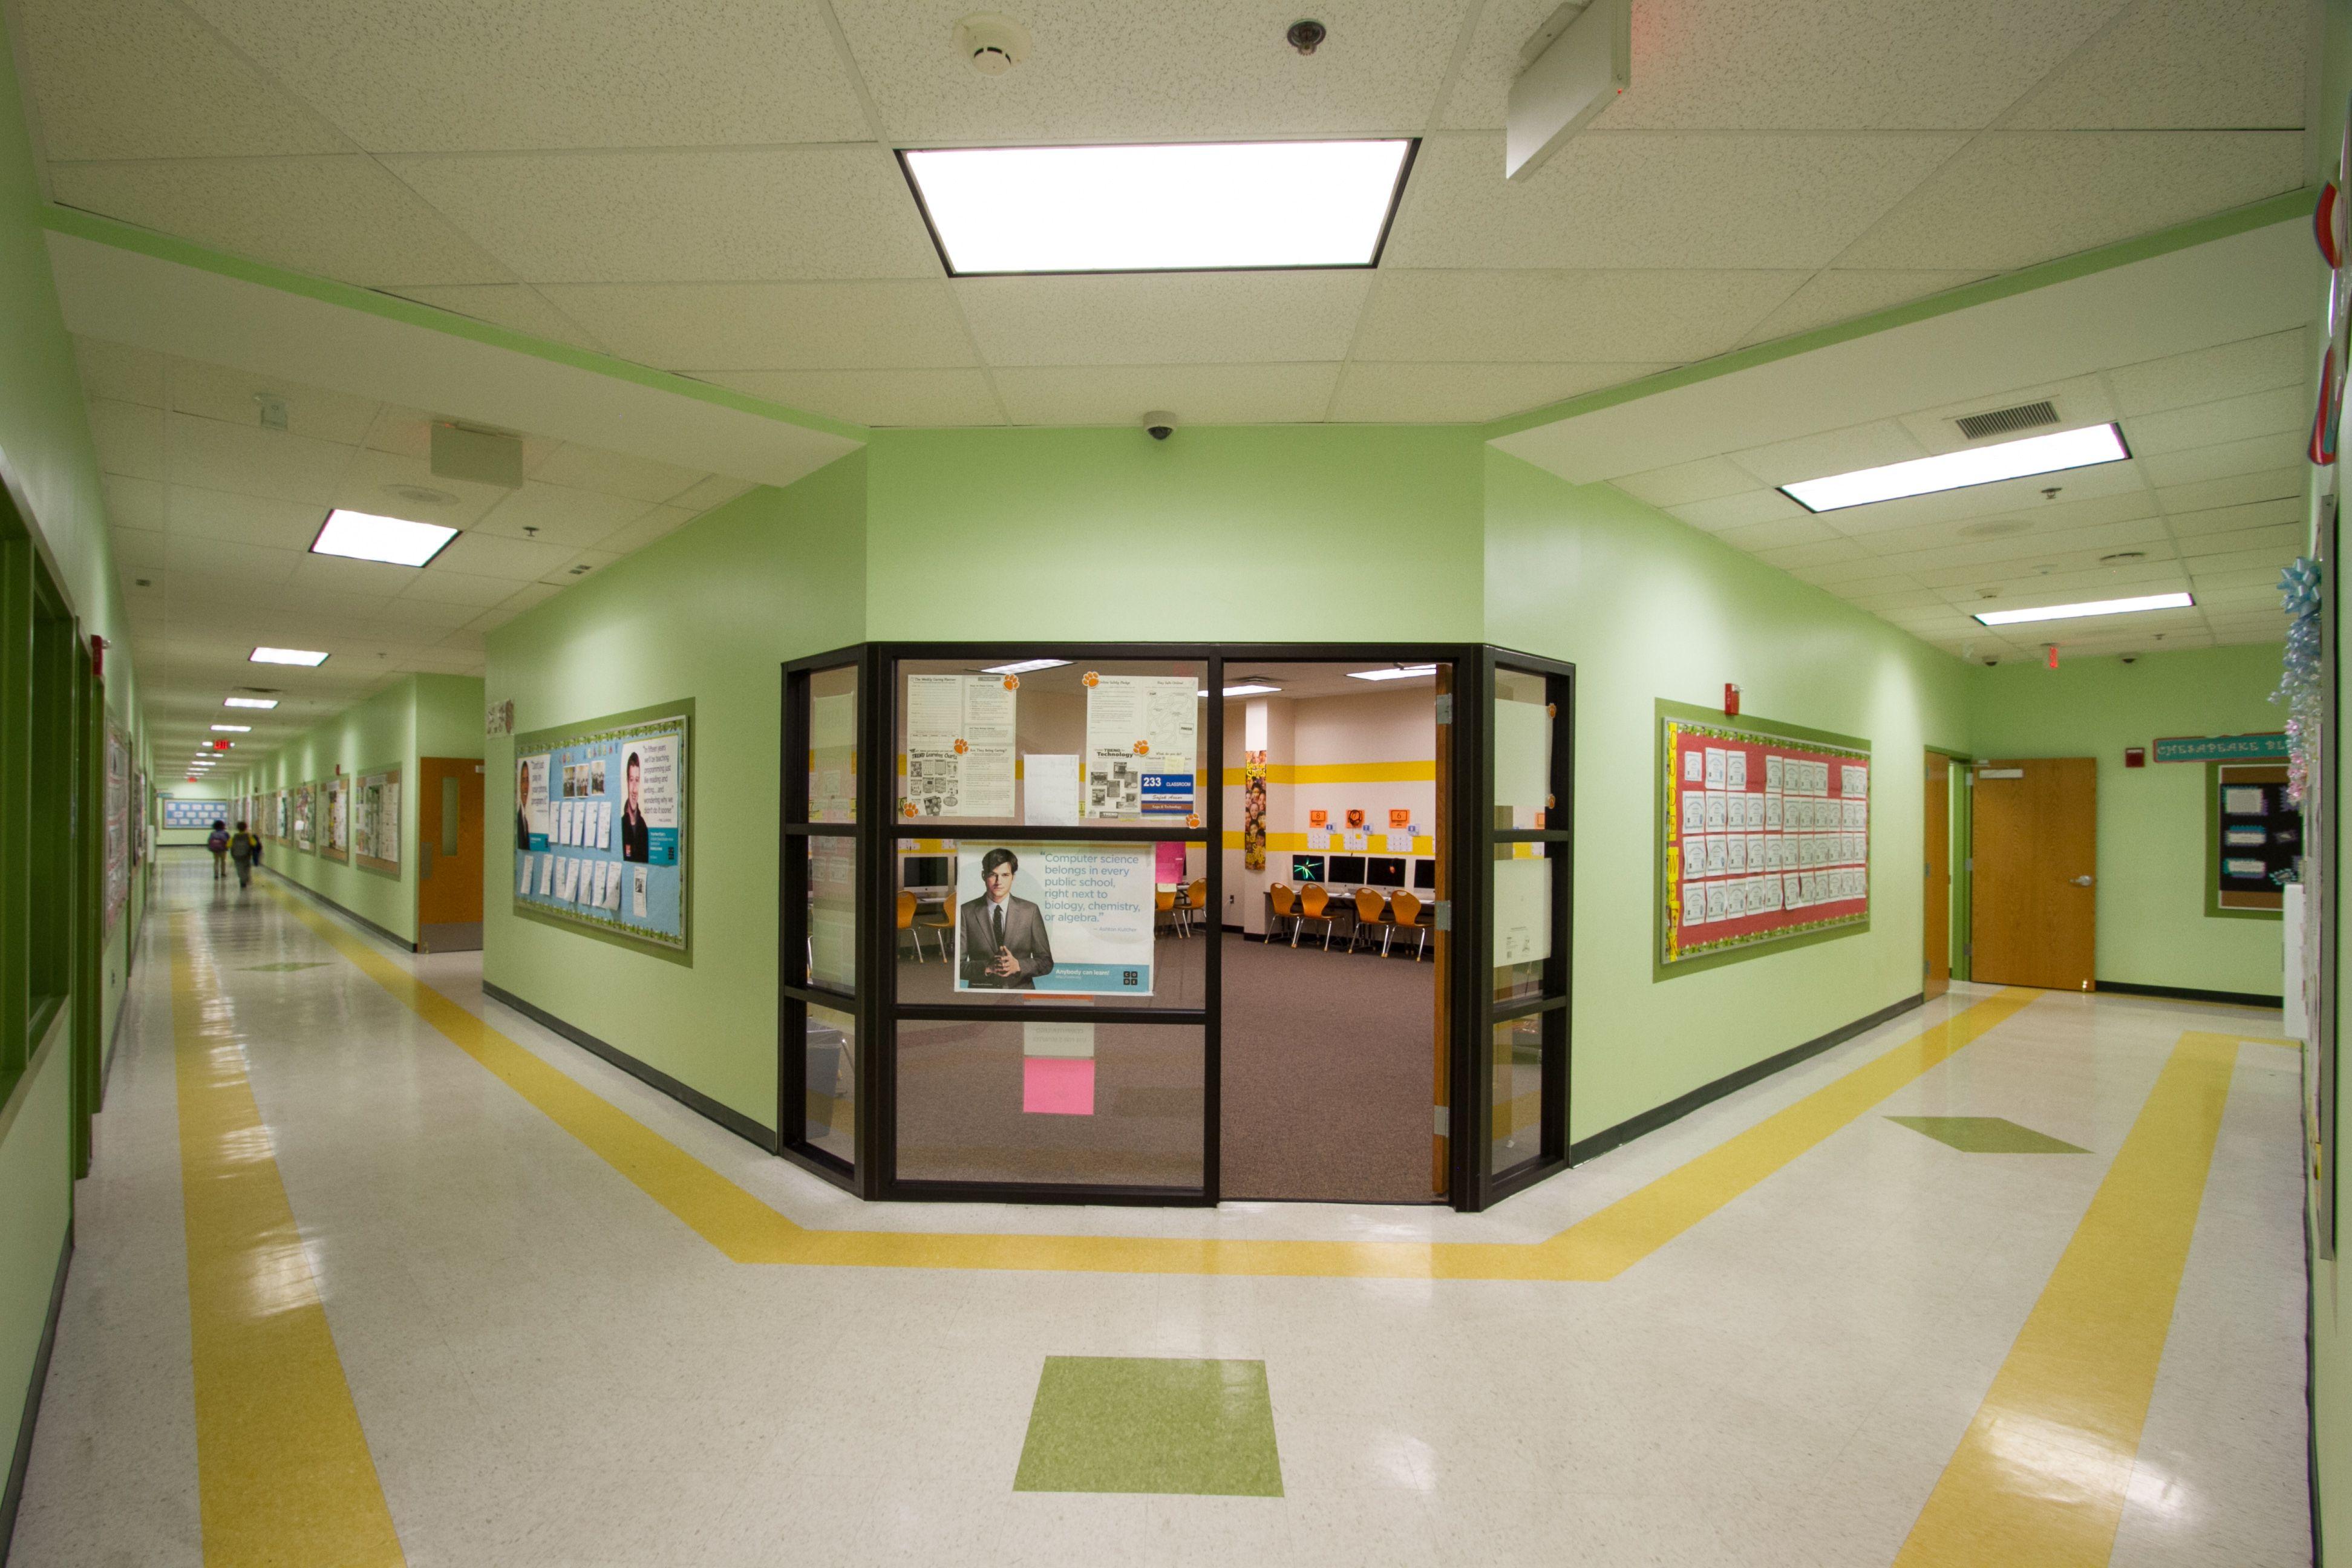 Elementary school hallway with computer lab